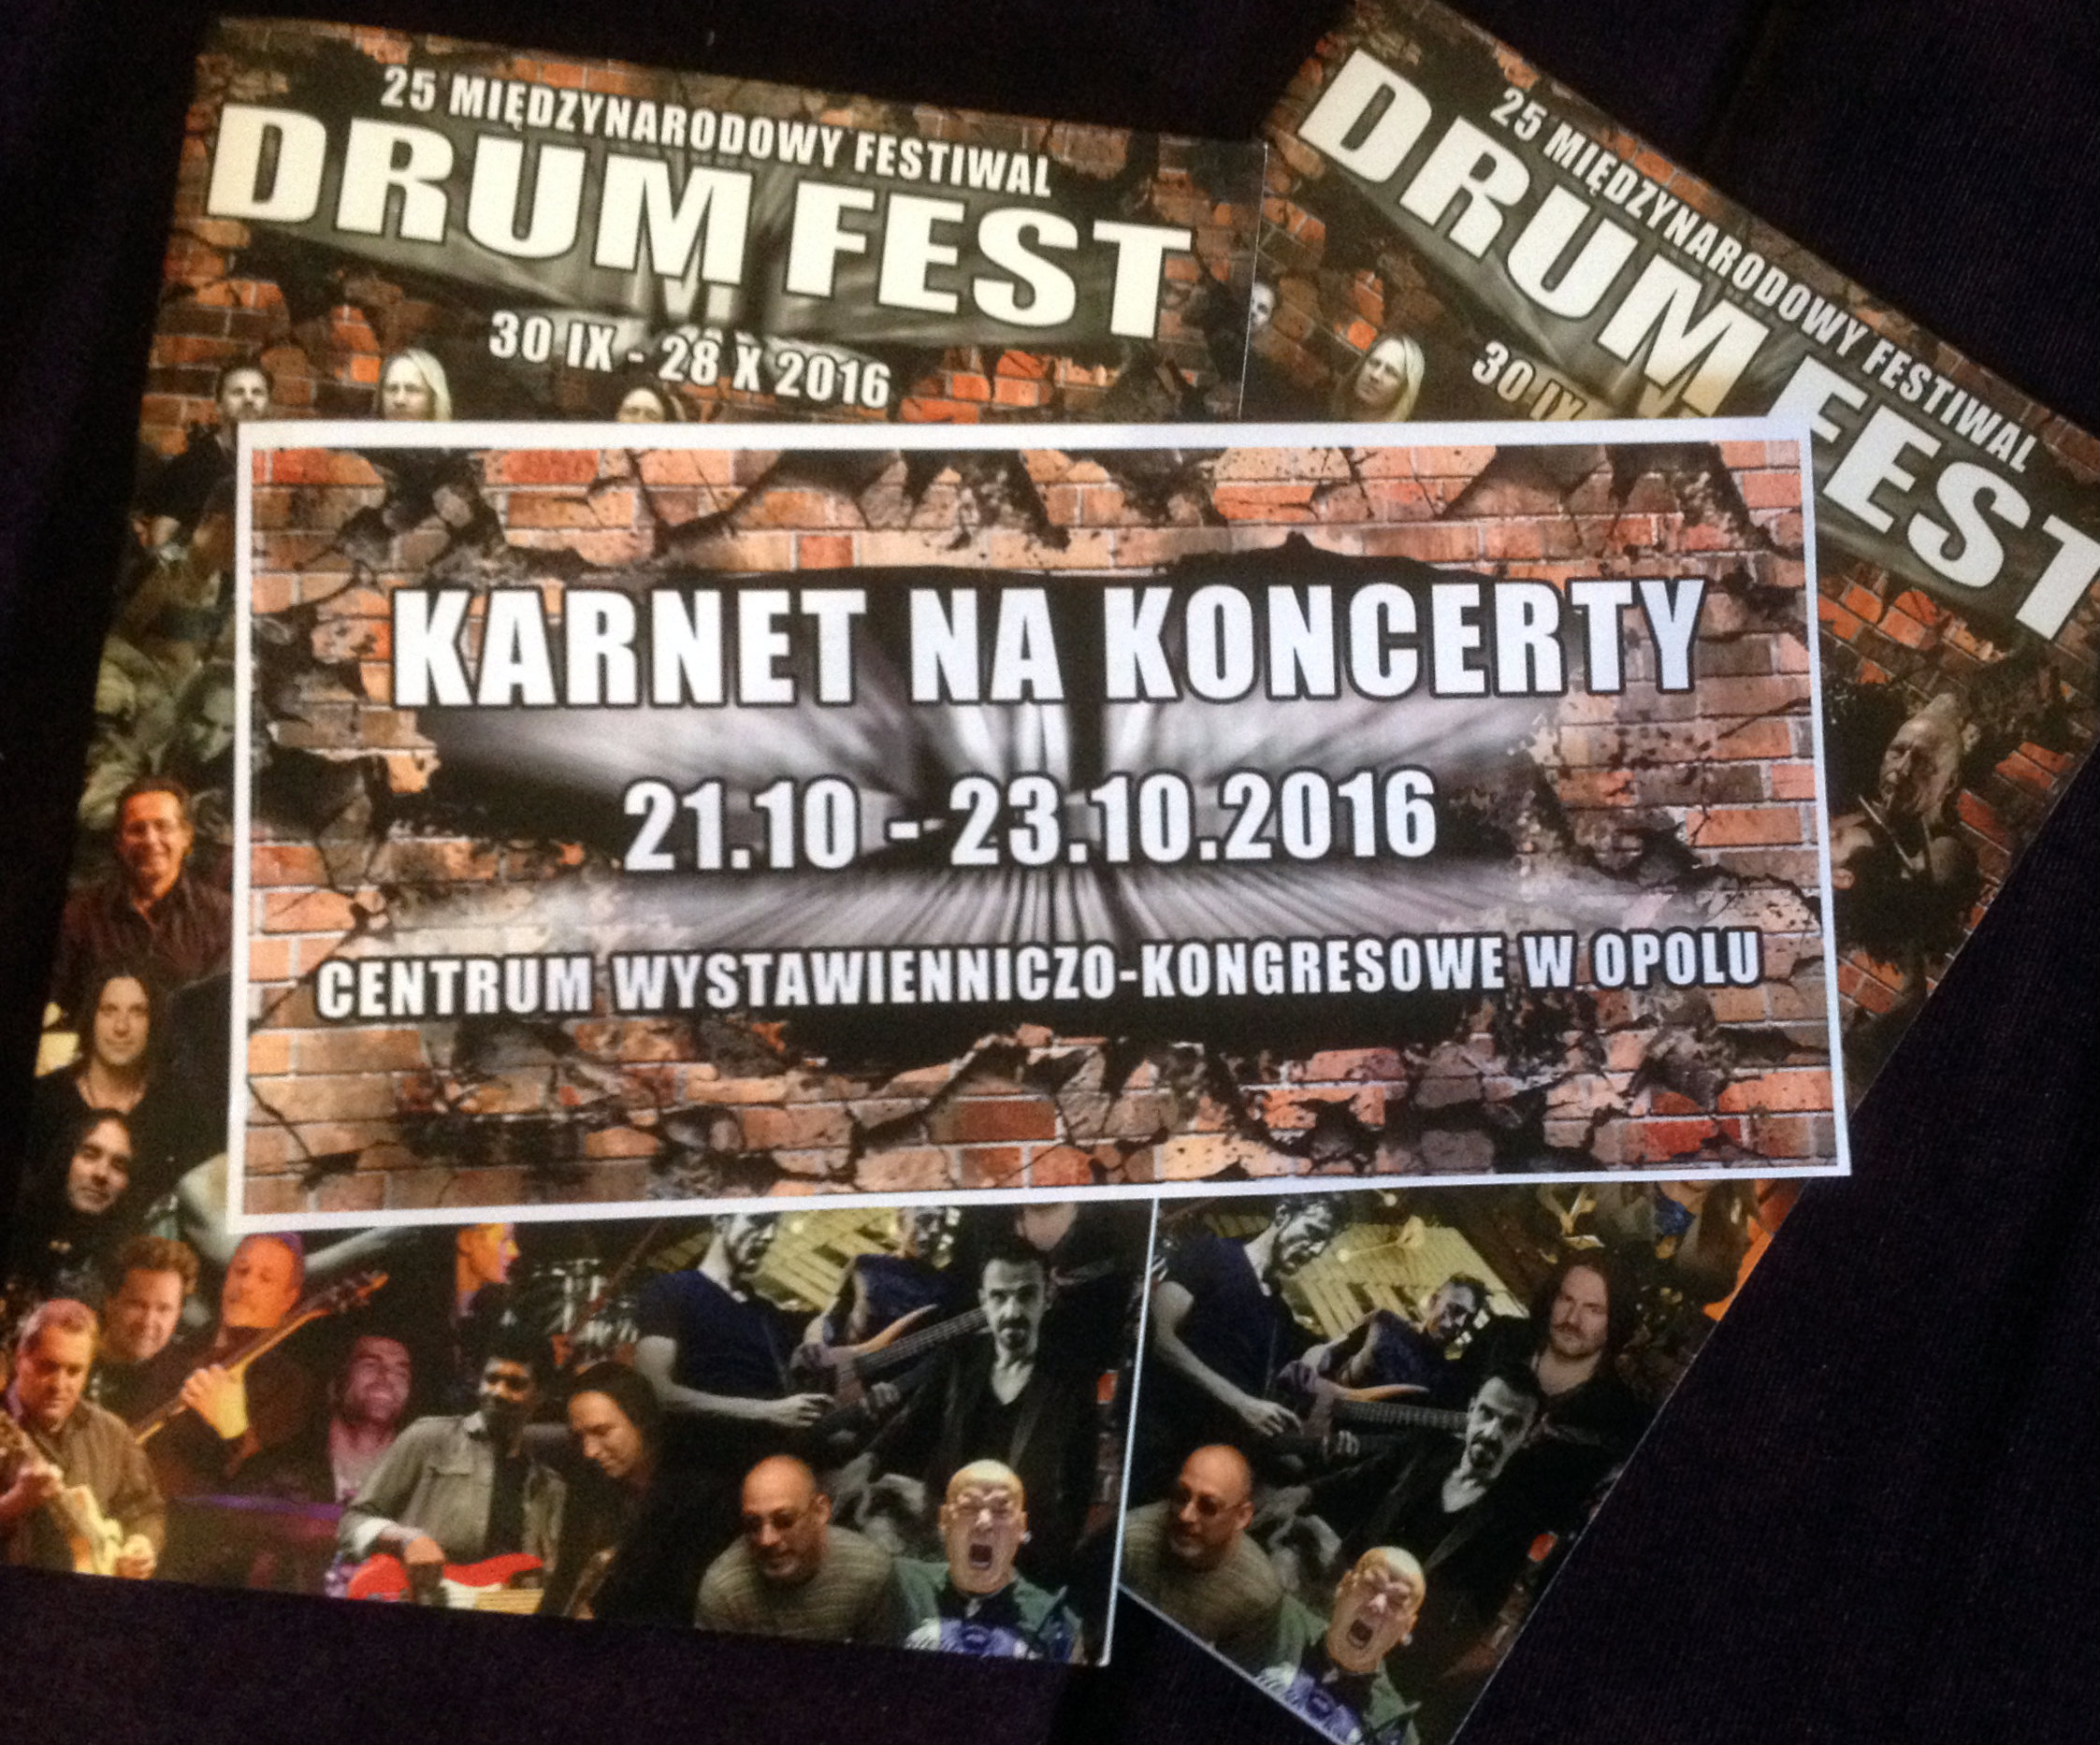 drumfest-karnet